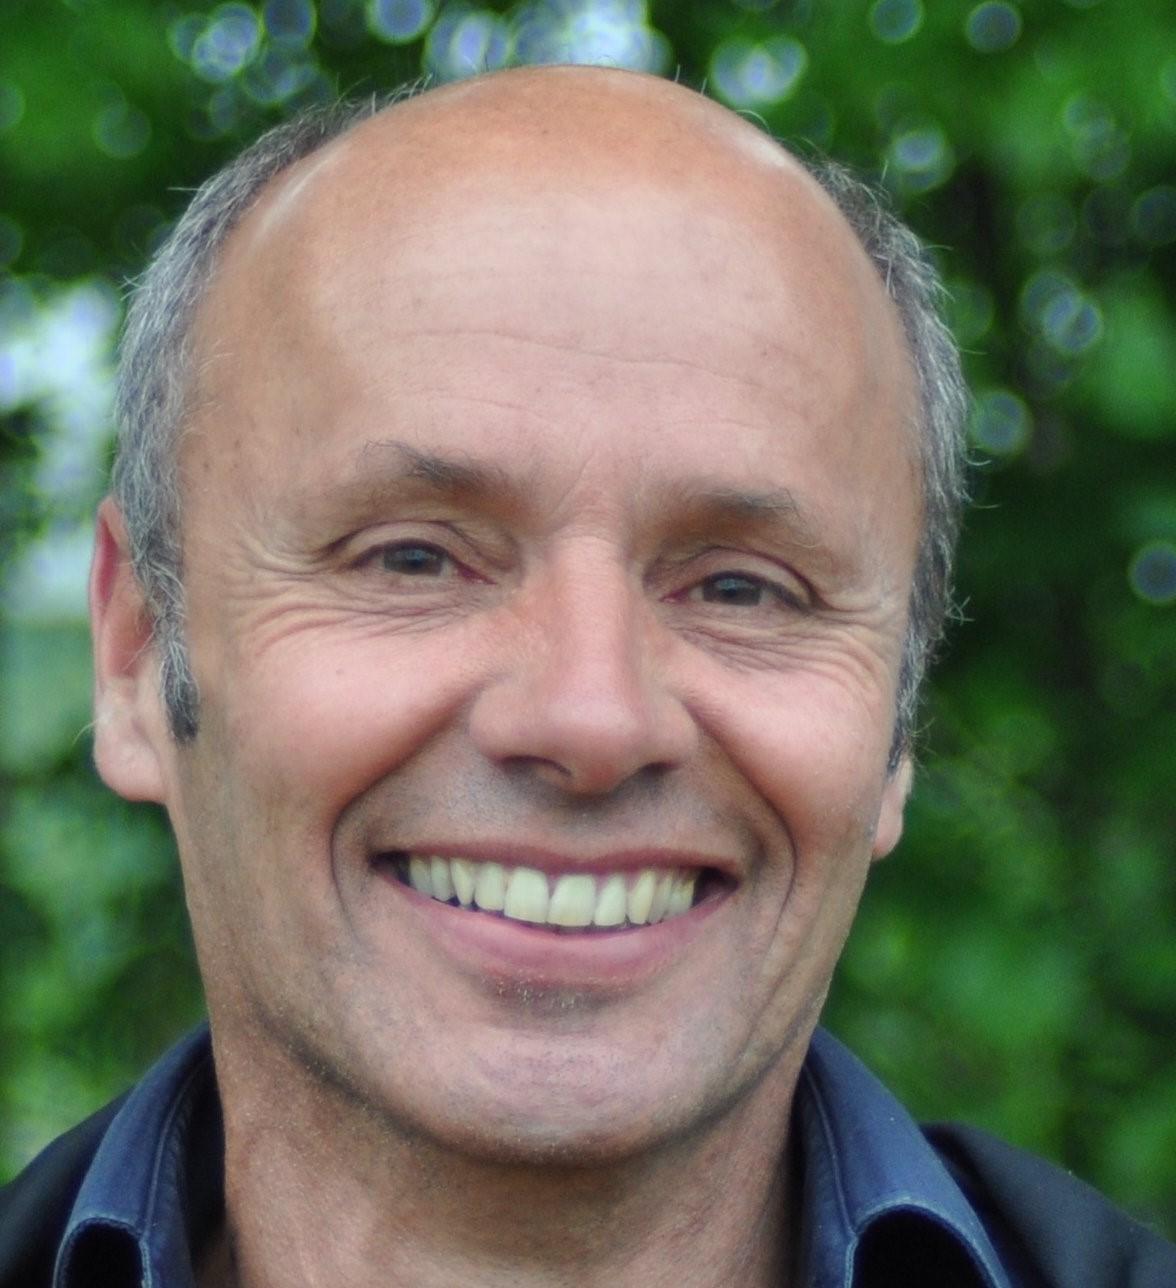 Geert Berghuis